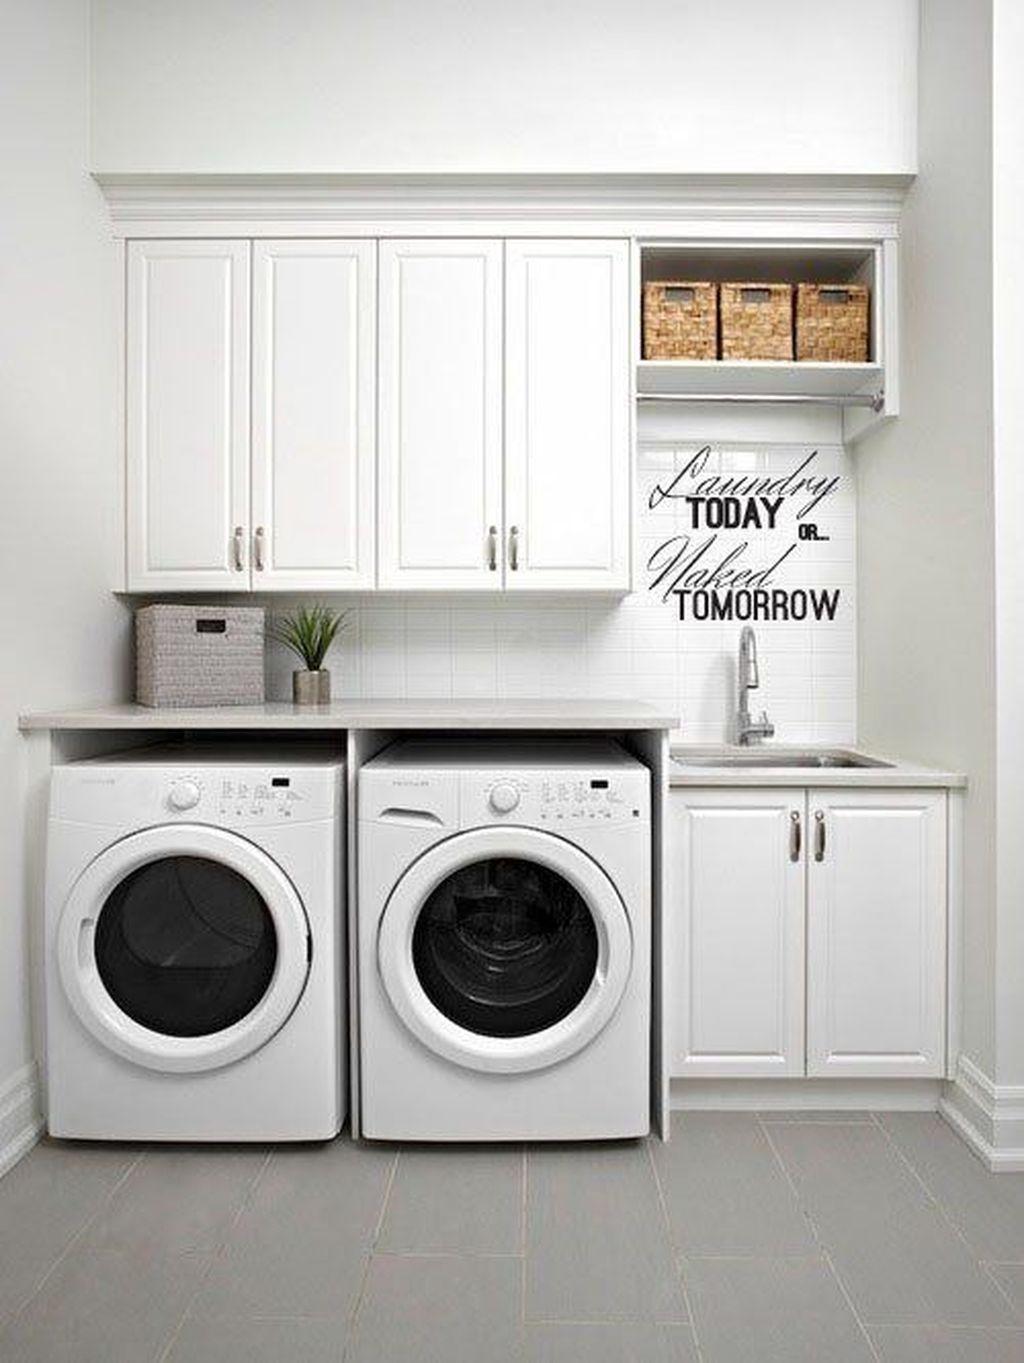 50 Amazing Laundry Room Tile Design - HOMISHOME on Amazing Laundry Rooms  id=77595